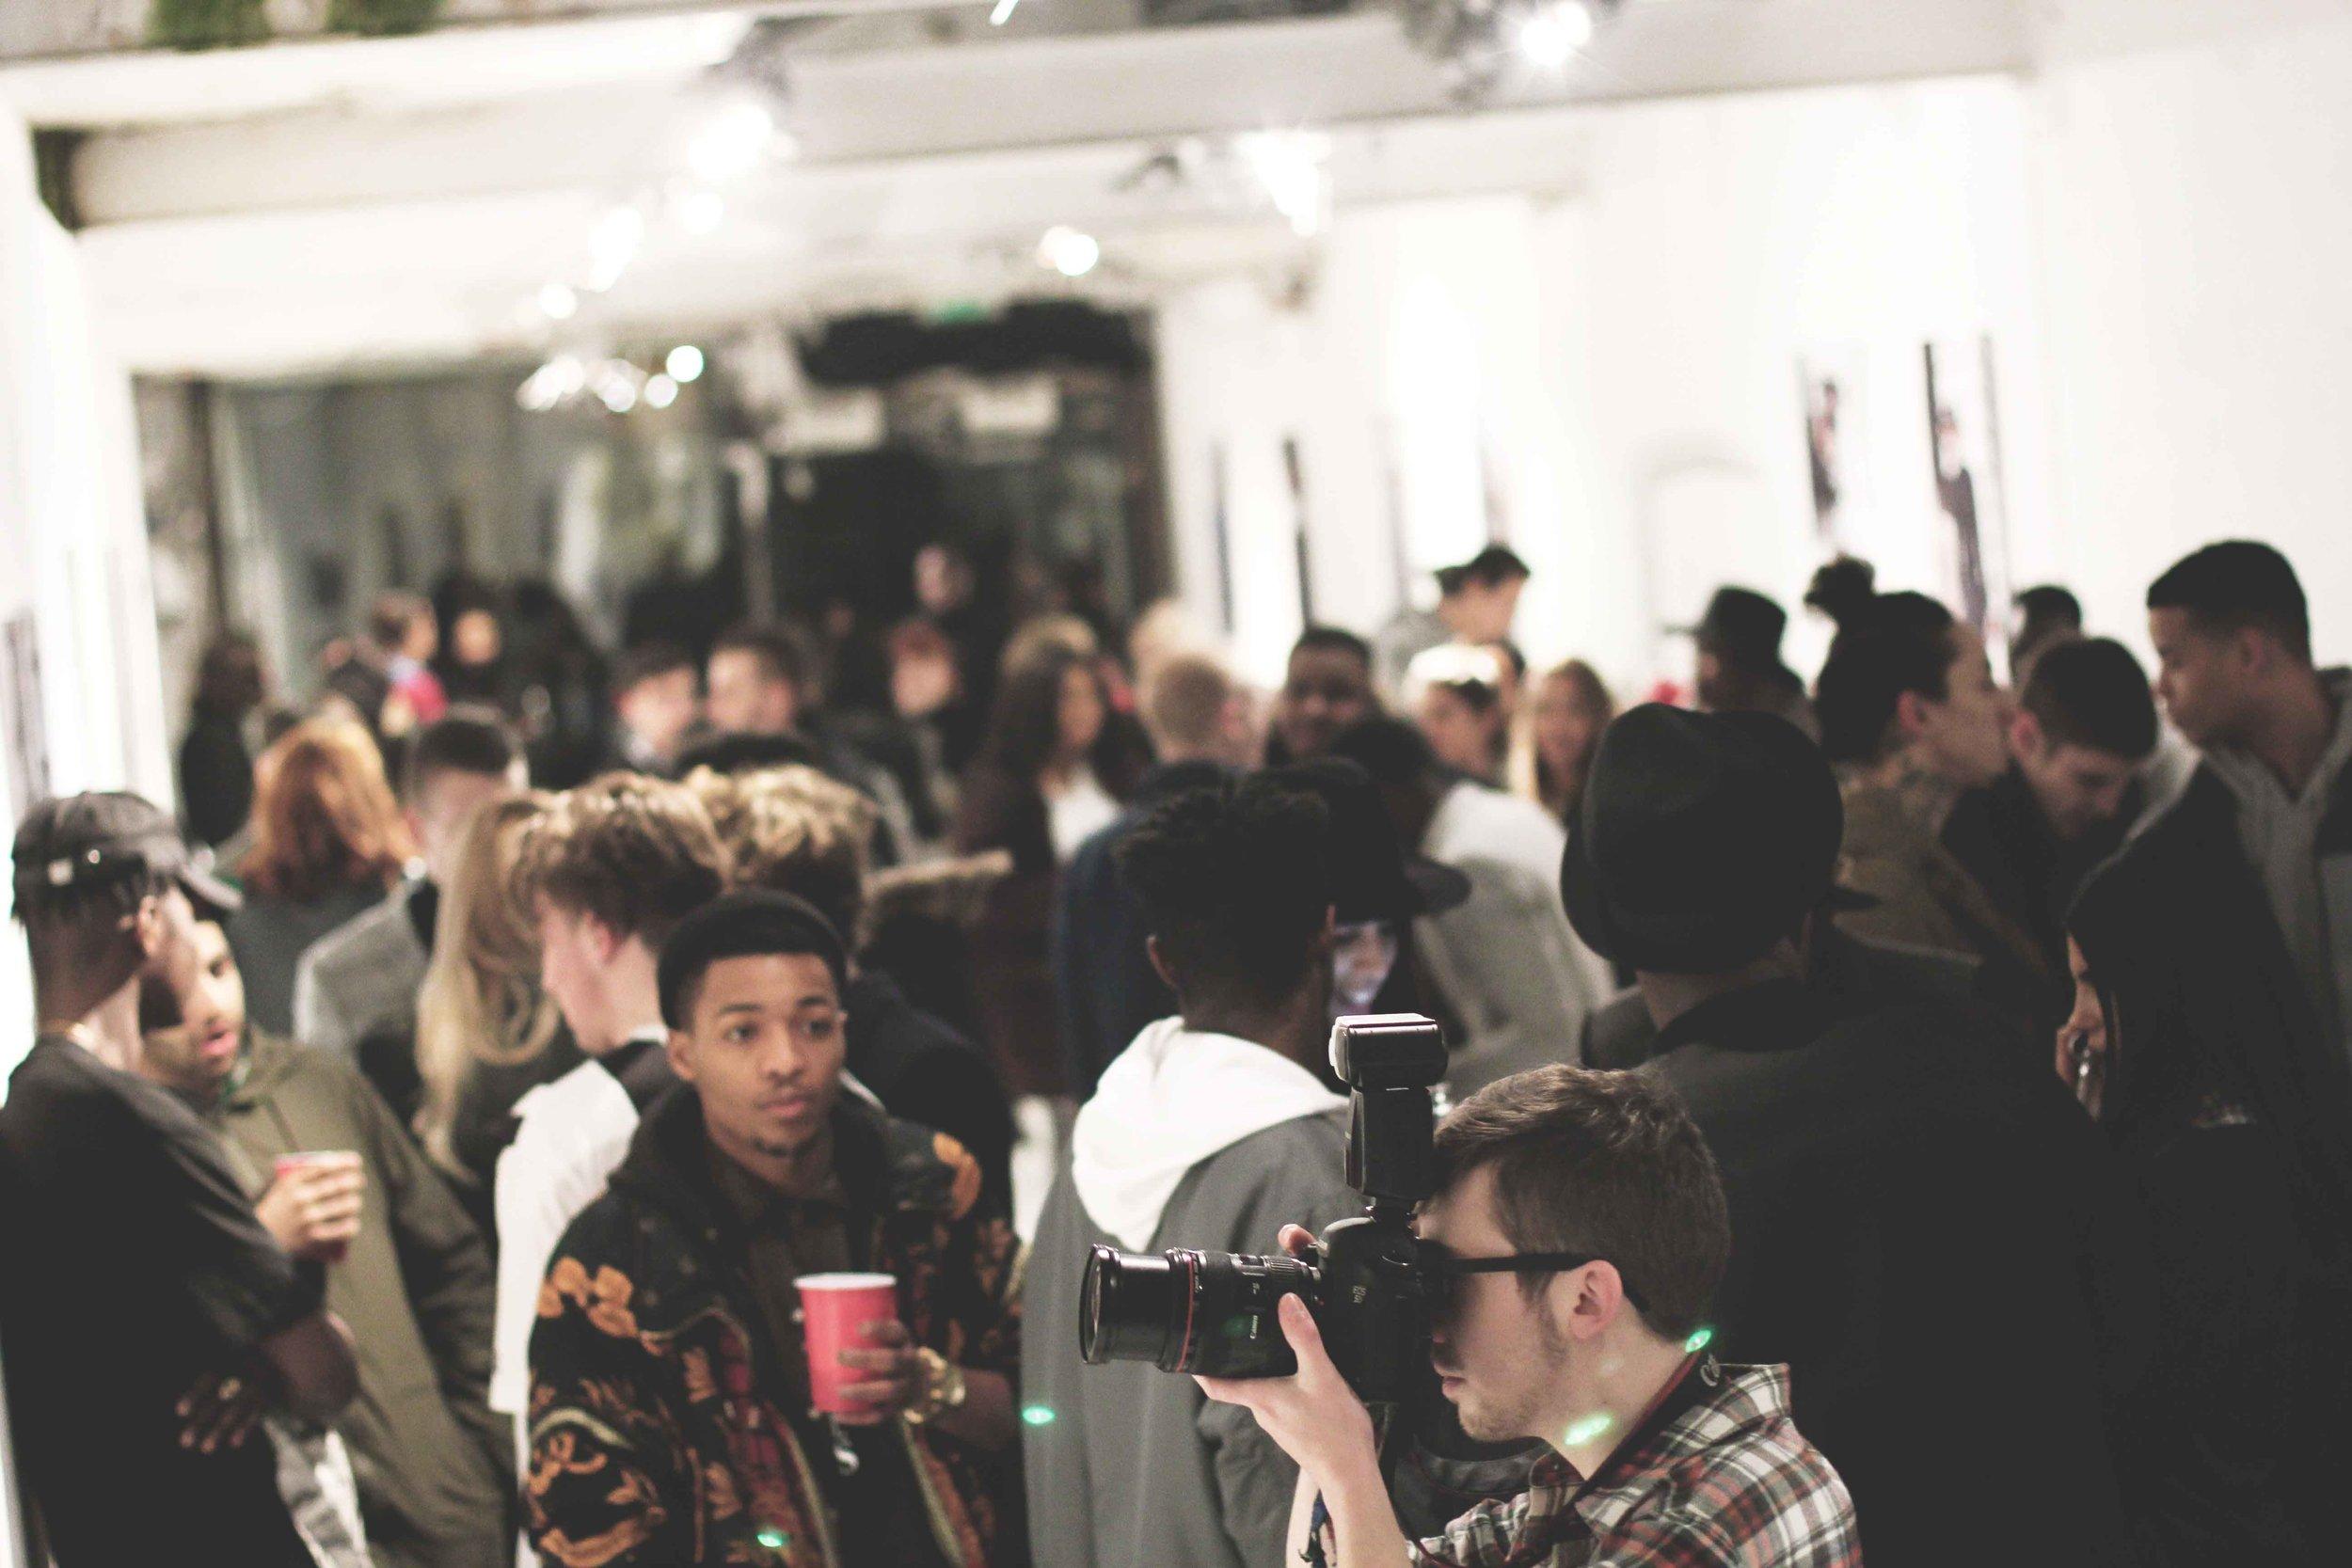 Jordan_Bunker_PAUSE_street_style_exhibition_8.jpg